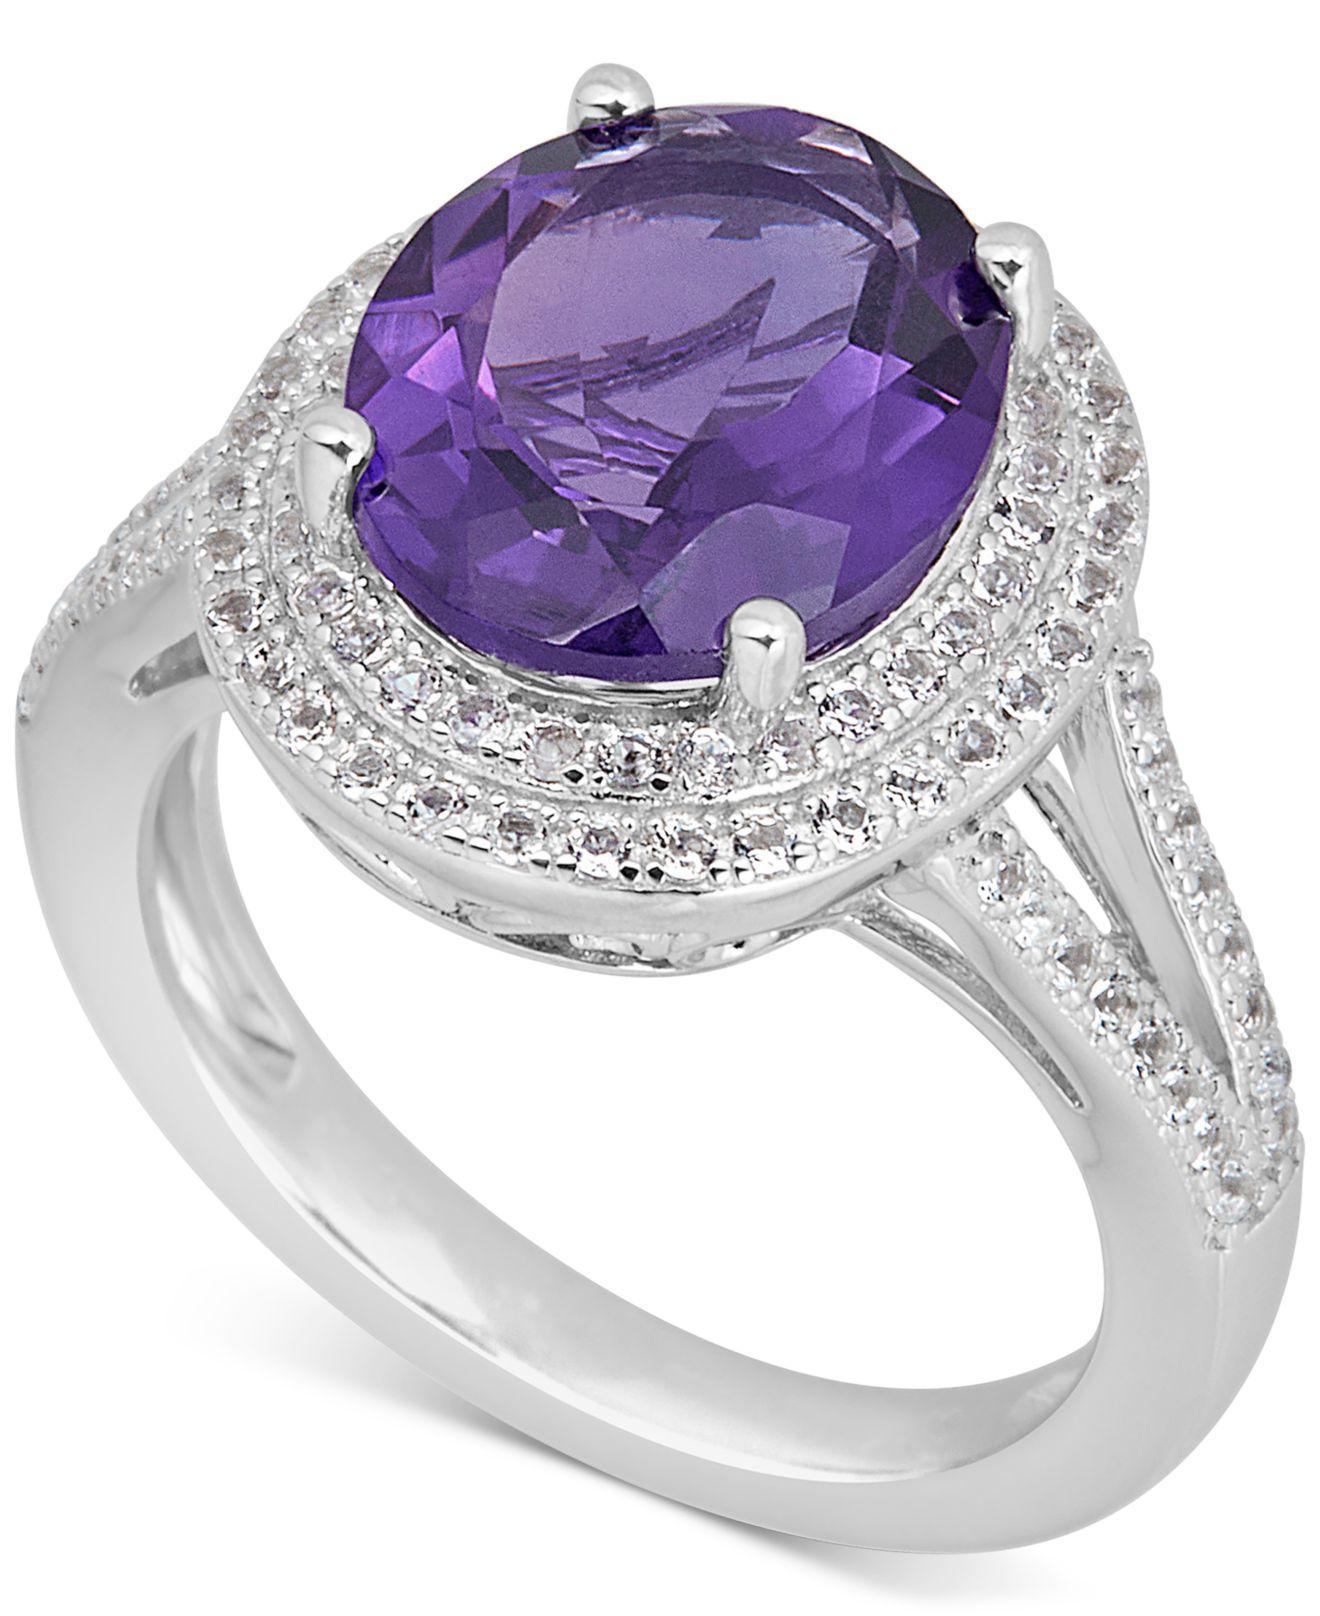 Gem Stone King Round Purple Amethyst White Topaz 18K Rose Gold Plated Silver Pendant 0.26 cttw